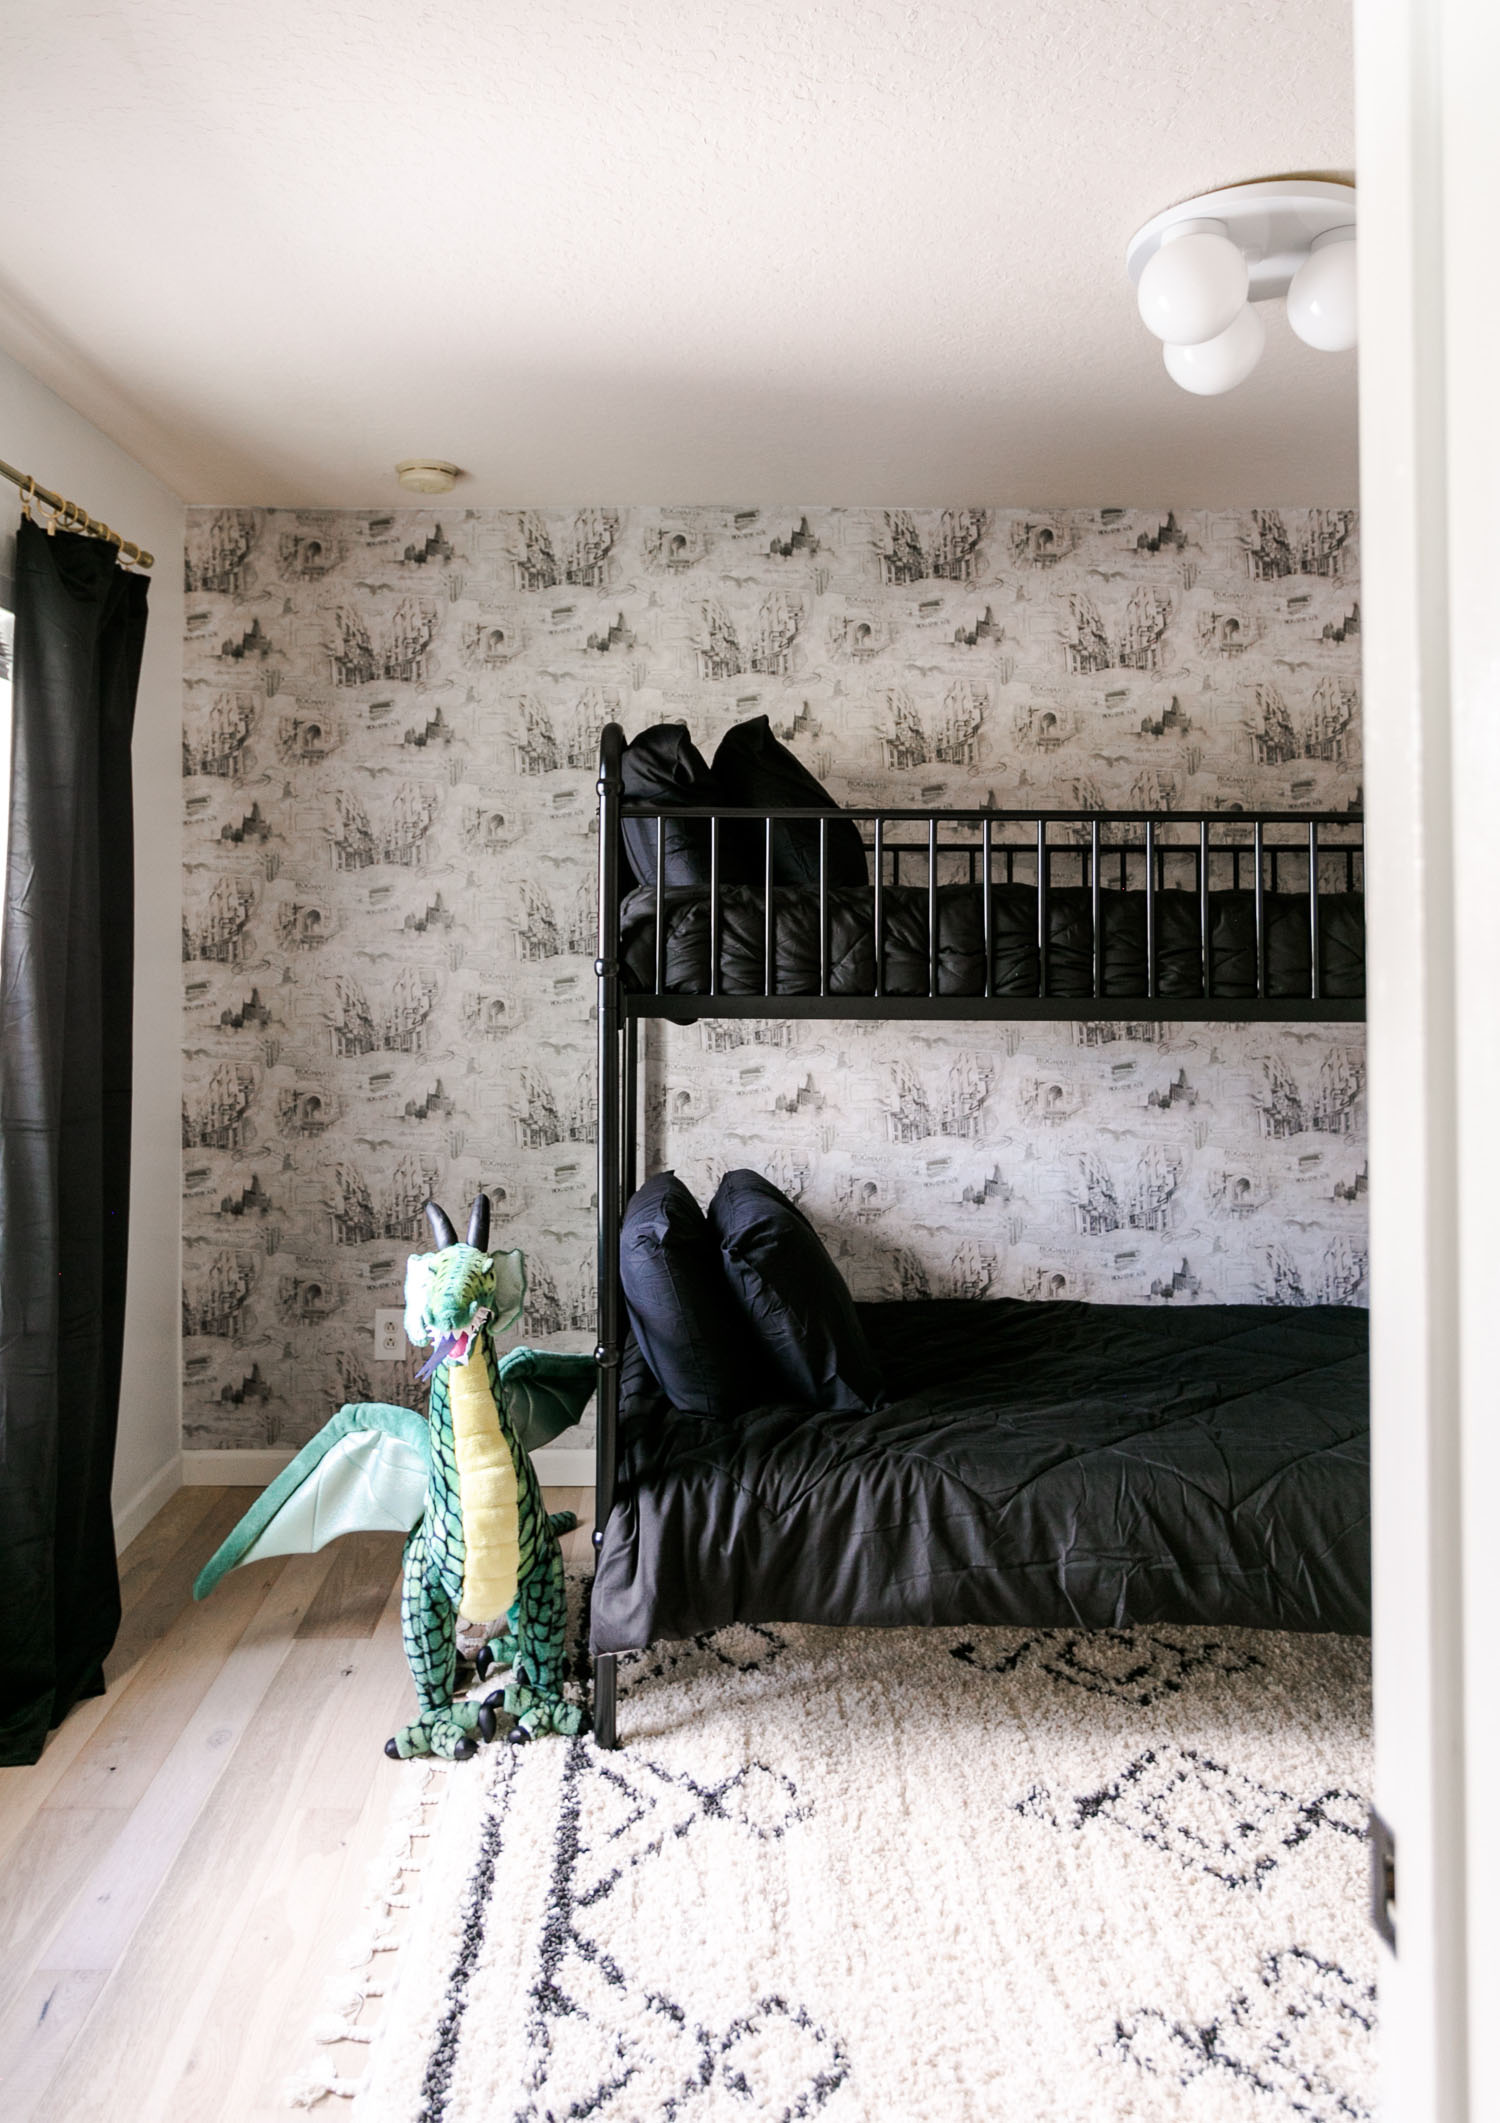 Harry Potter-Inspired Bedroom